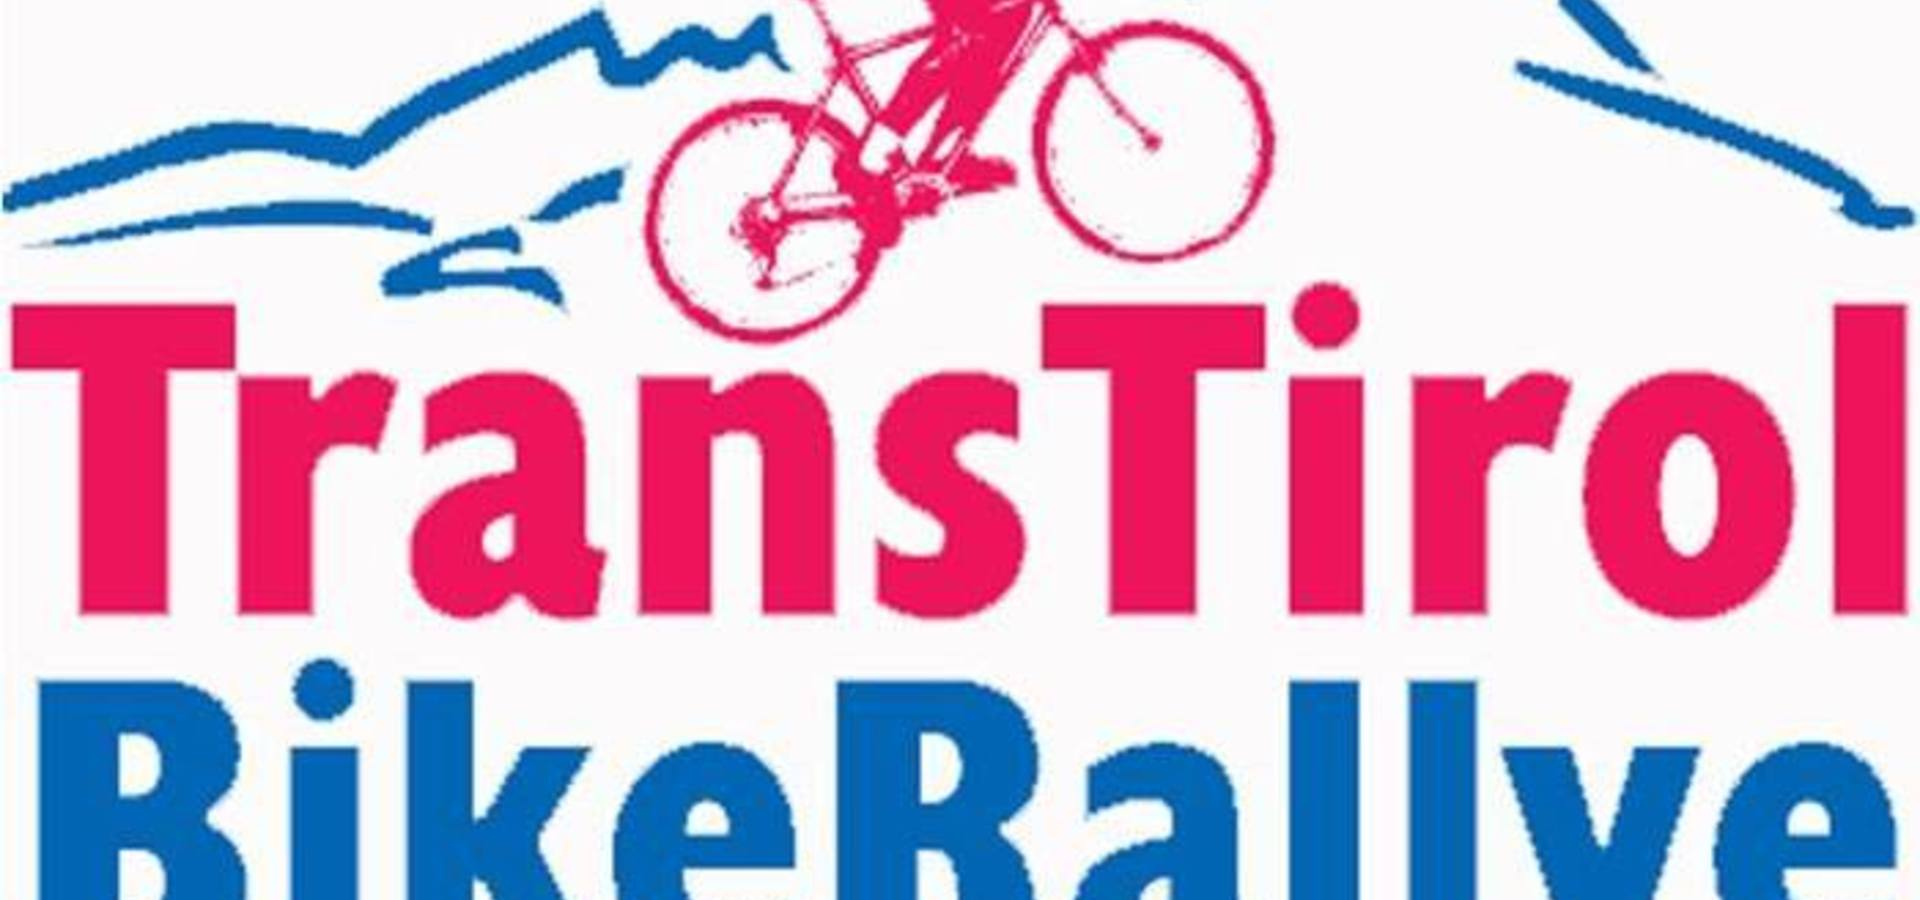 La TransTirol Bike Rallye 2019 attraversa le splendide montagne dolomitiche in Mtb